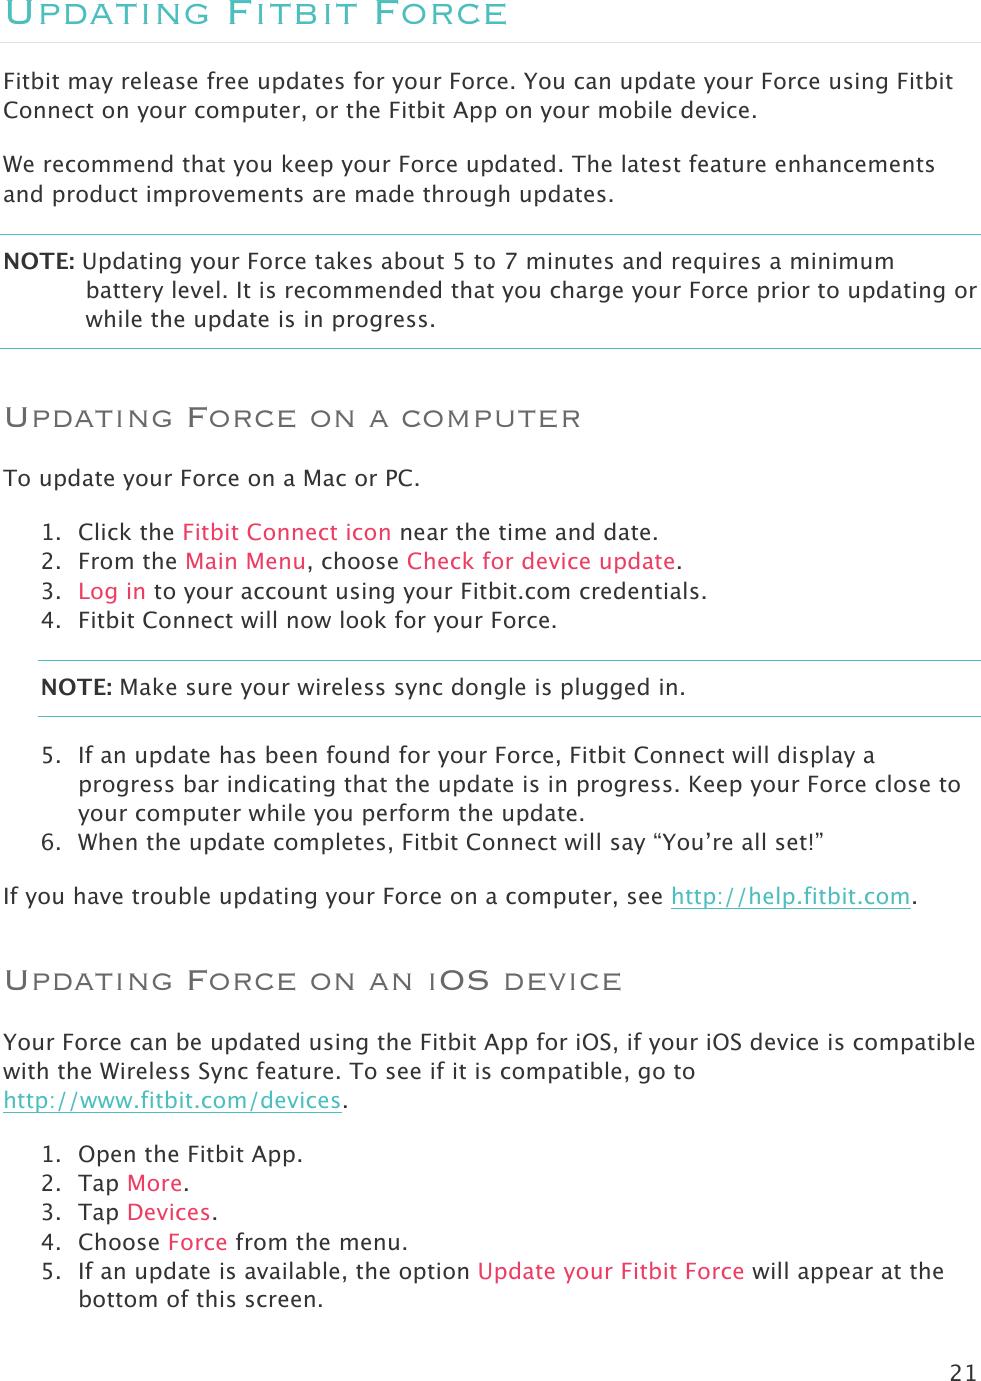 Fitbit FB402 Wireless Activity Tracker User Manual Neutrino Manual